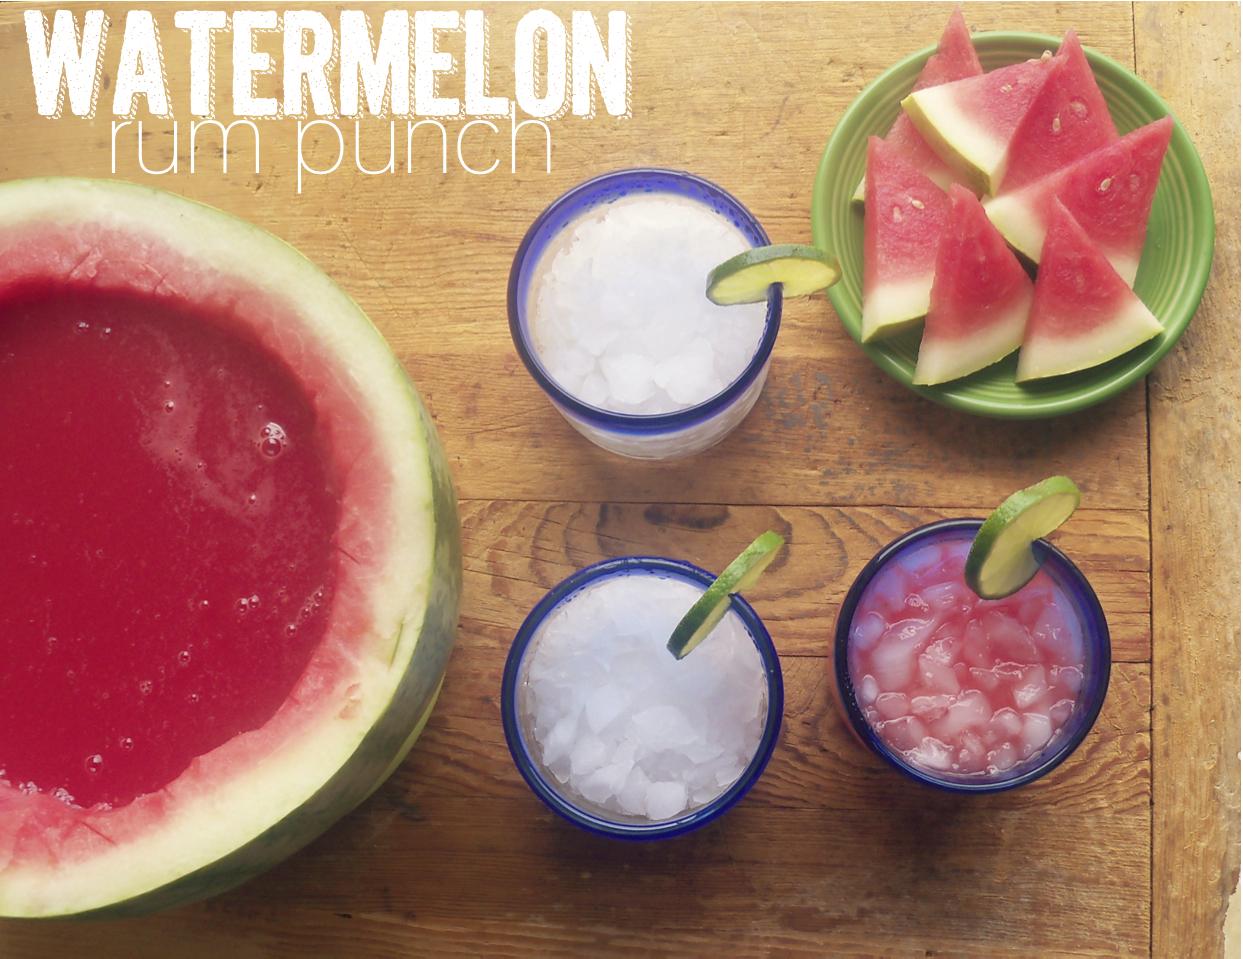 watermelonrumpunch